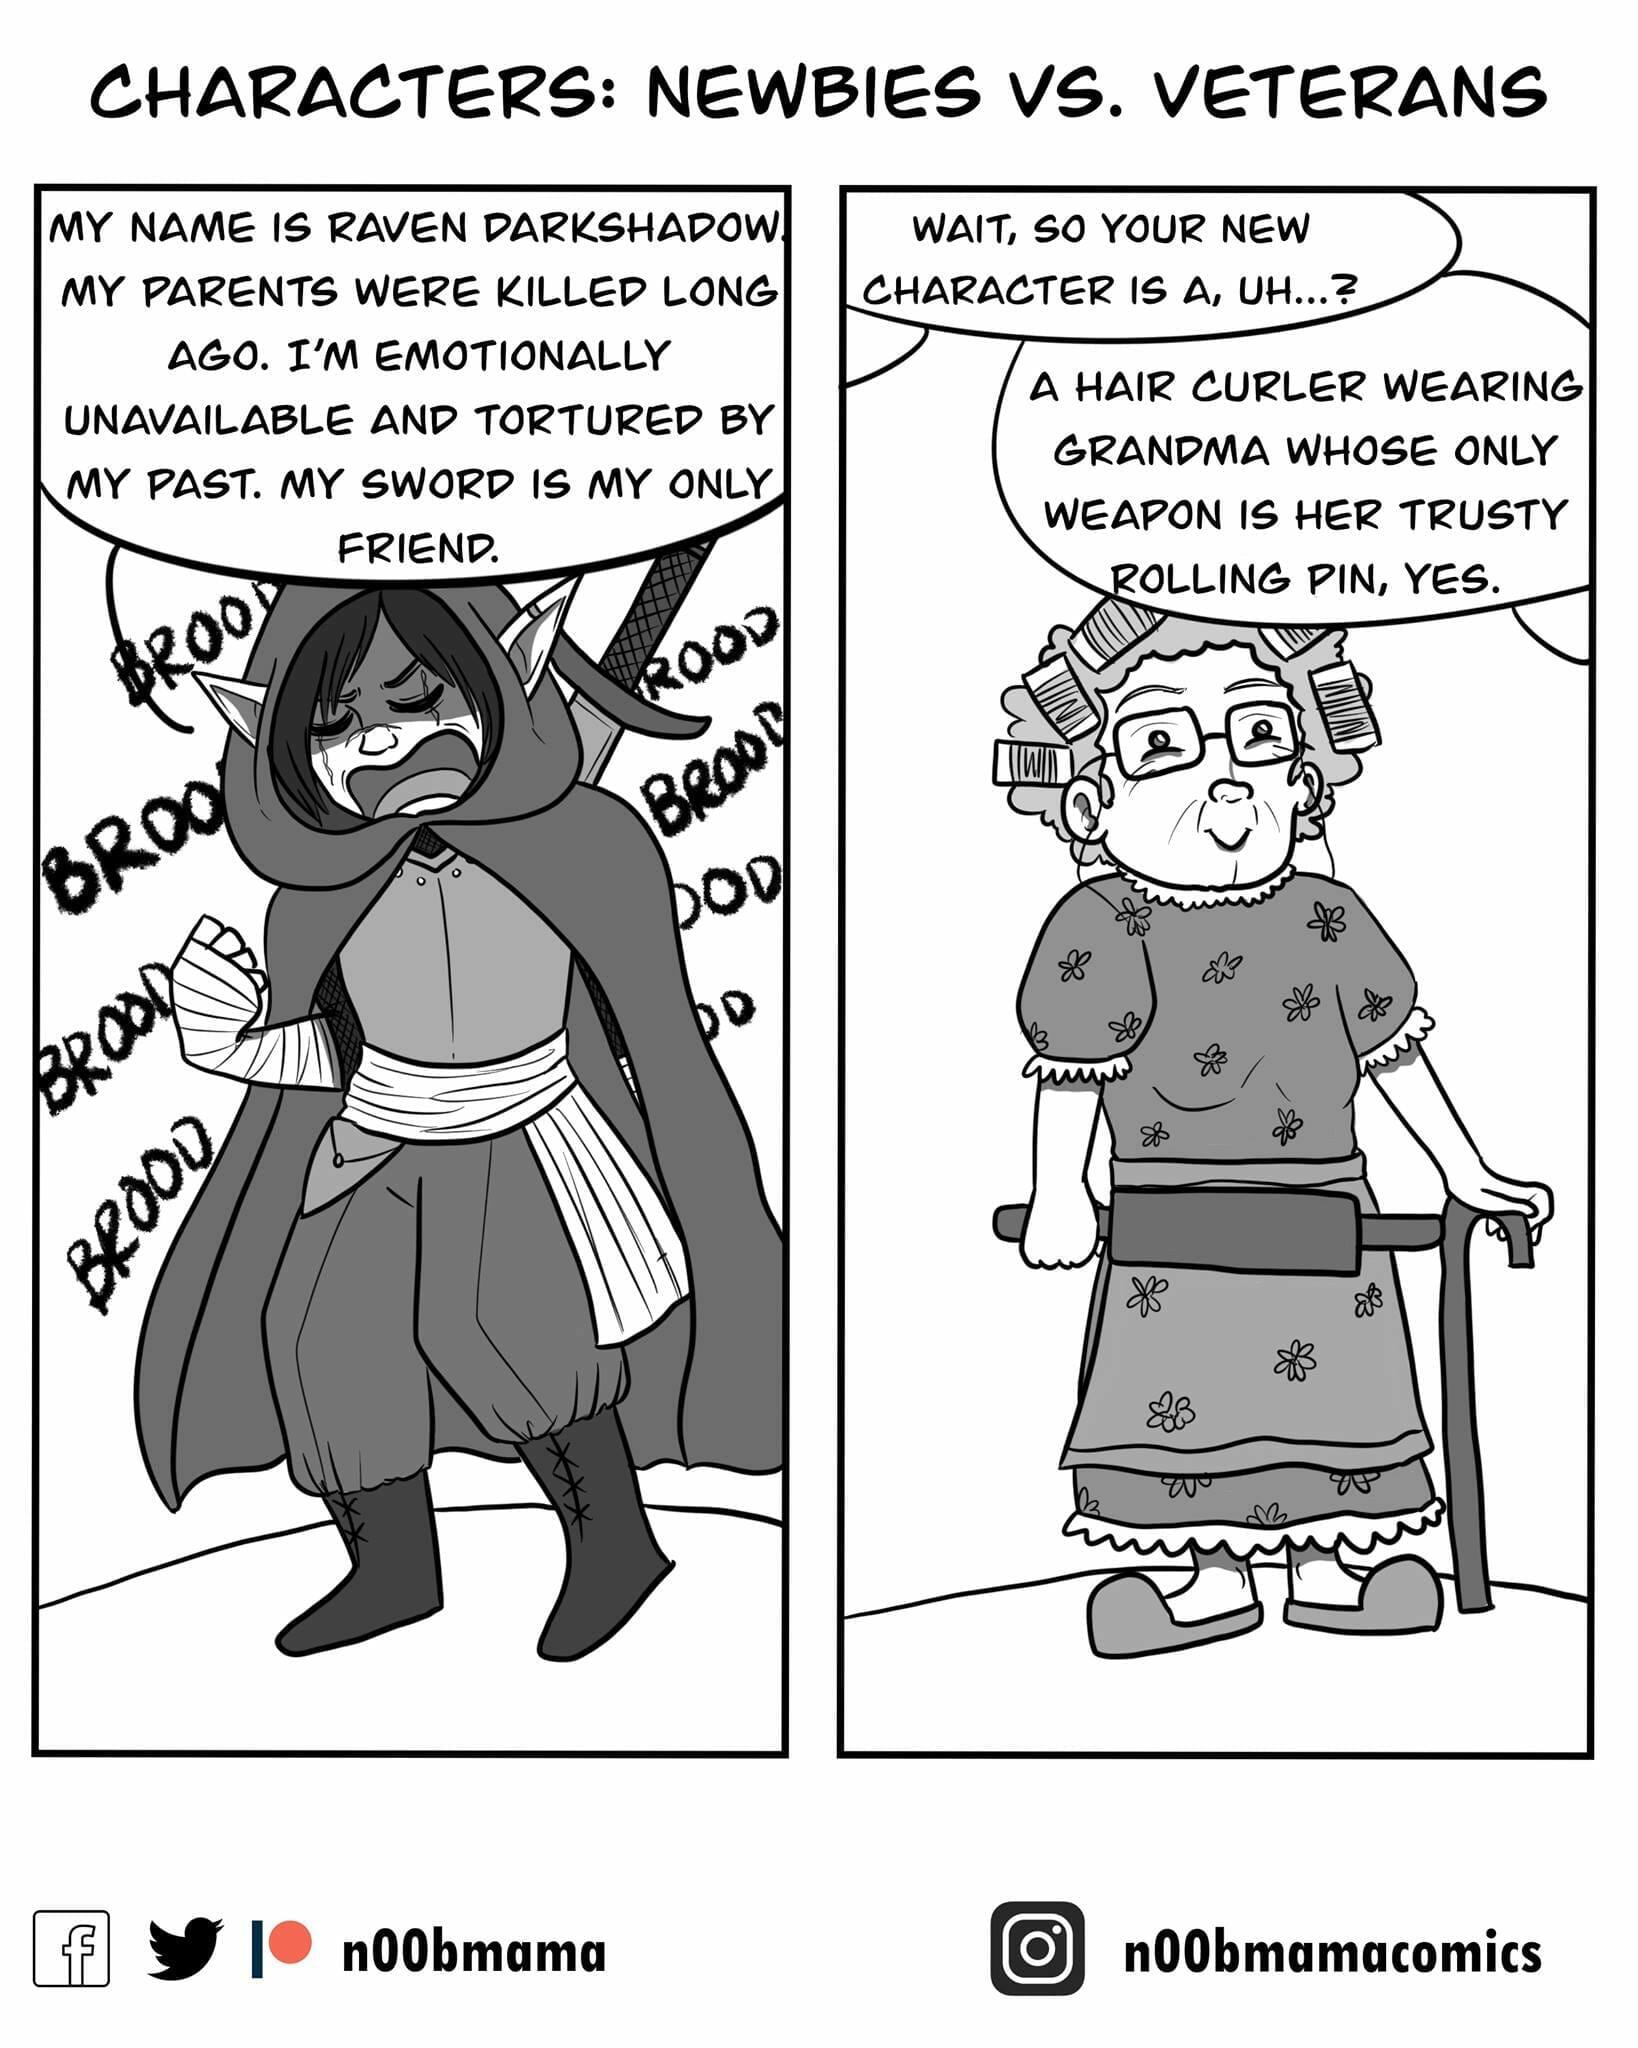 Characters: Newbies vs Veterans